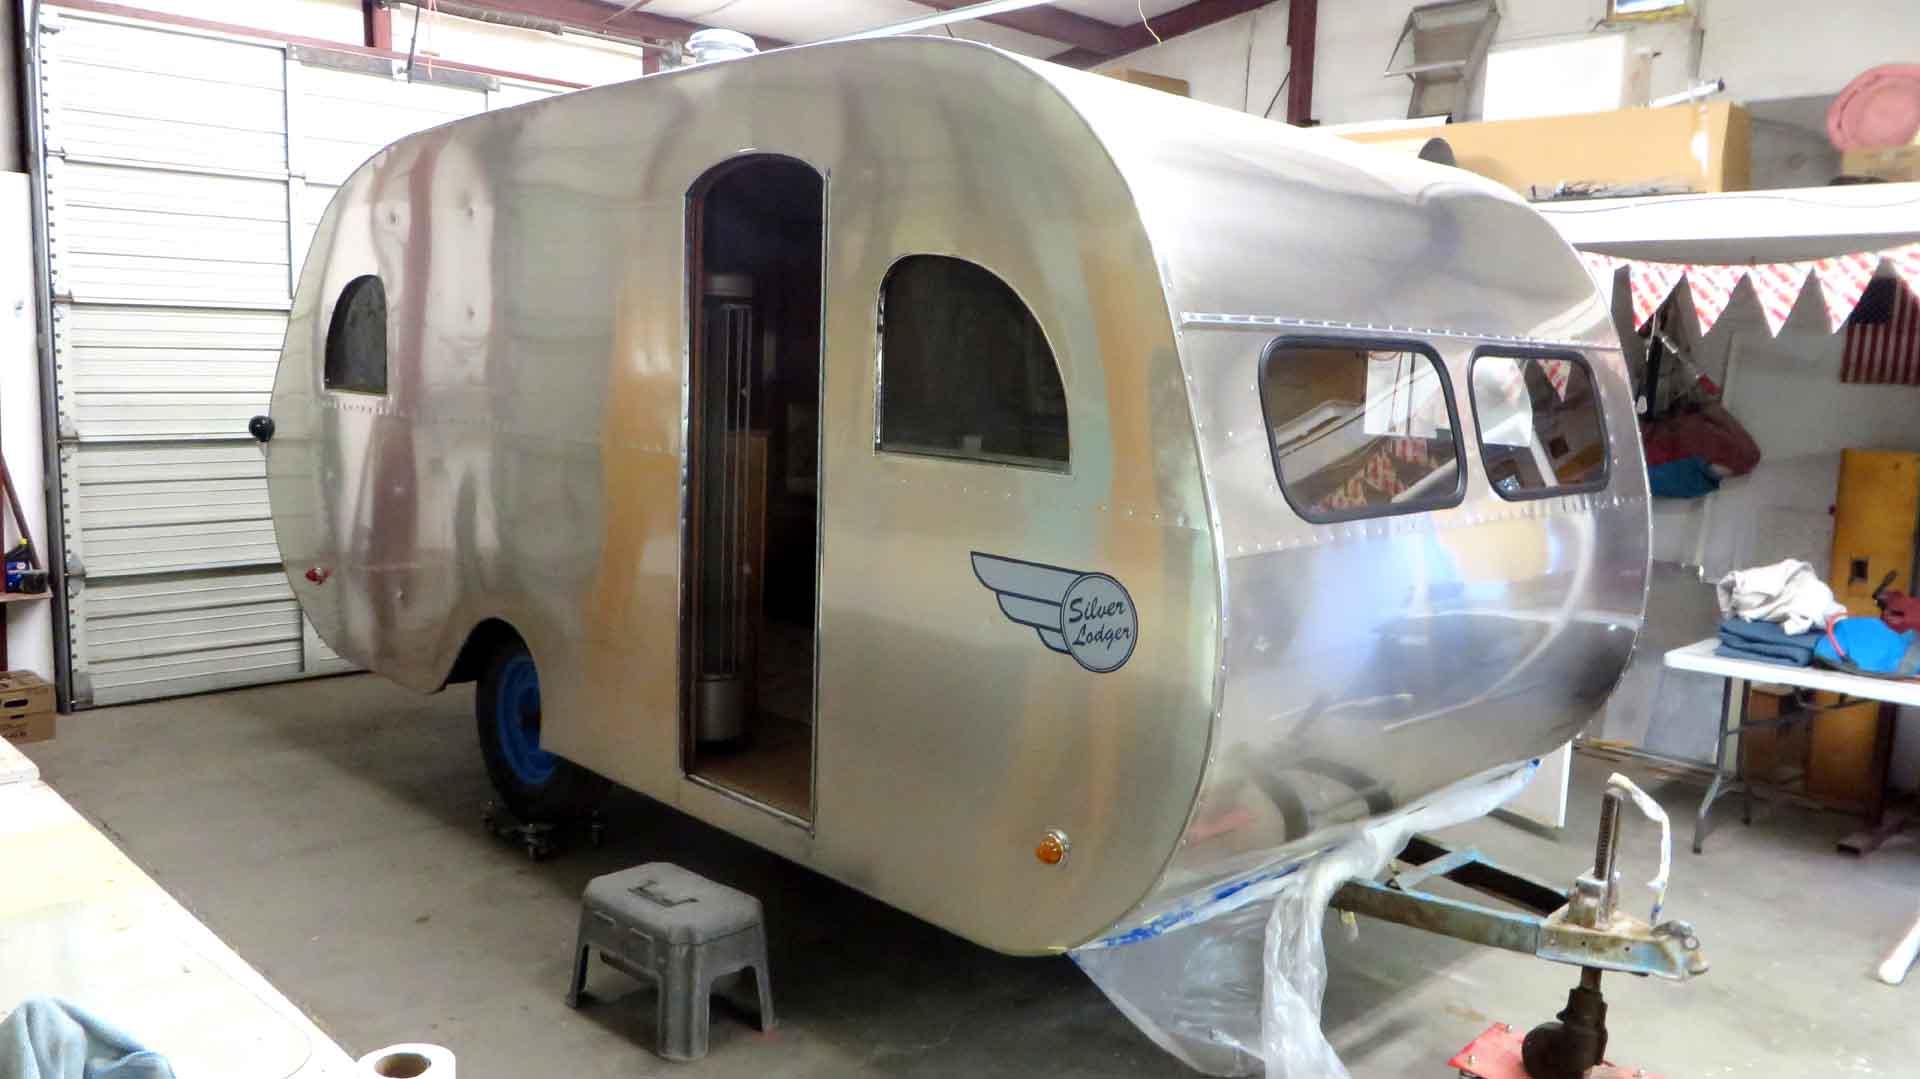 http://www.cannedhamtrailers.com/forum/47mainline/close17.JPG